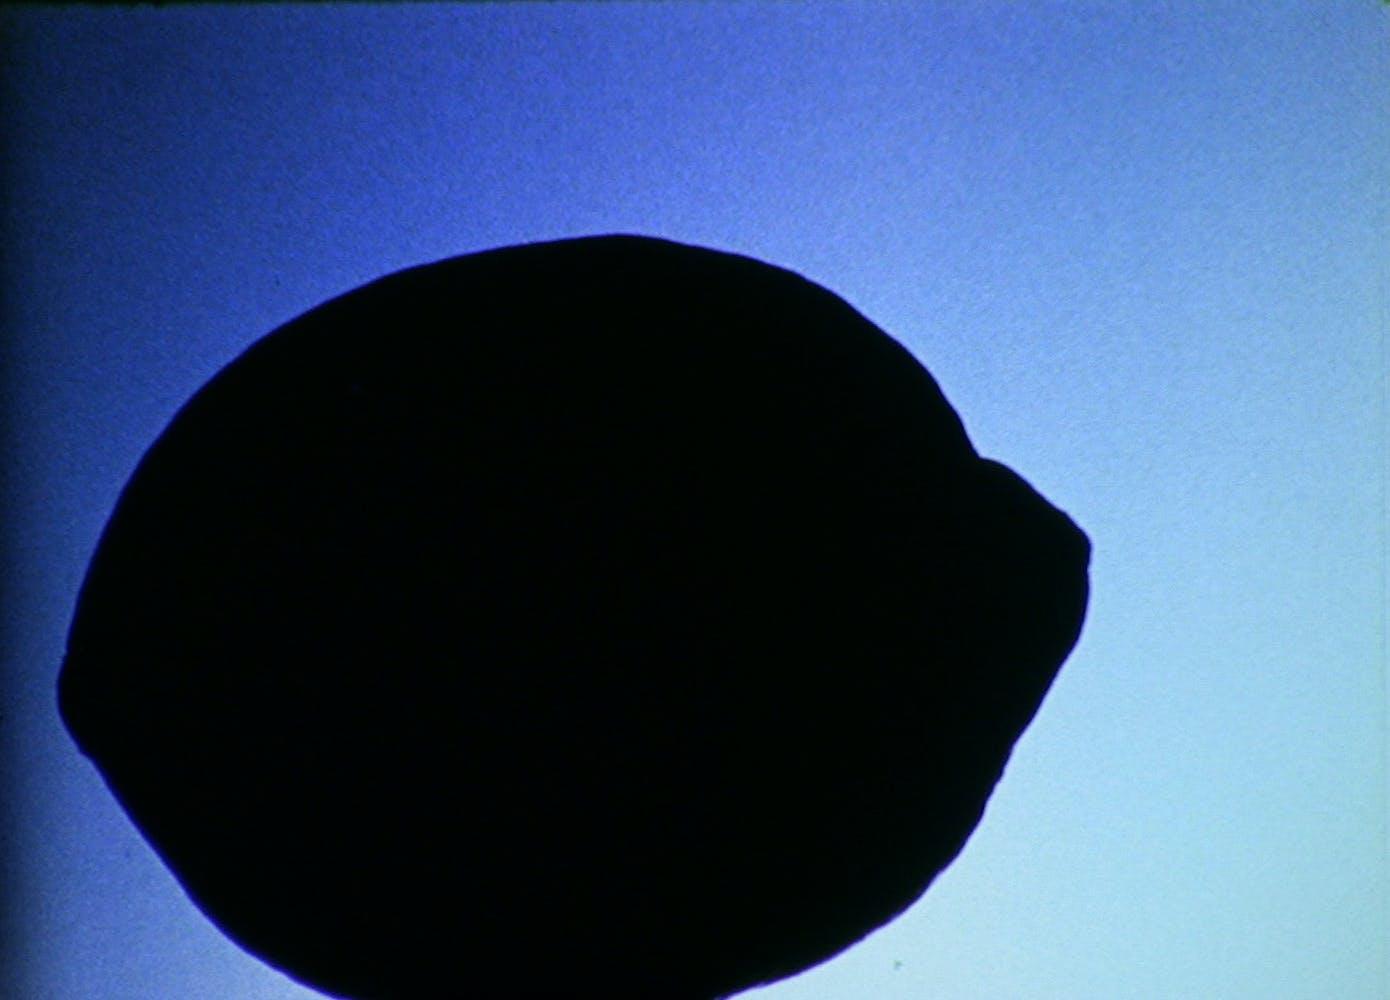 Hollis Frampton, Lemon, 1969 (film still)